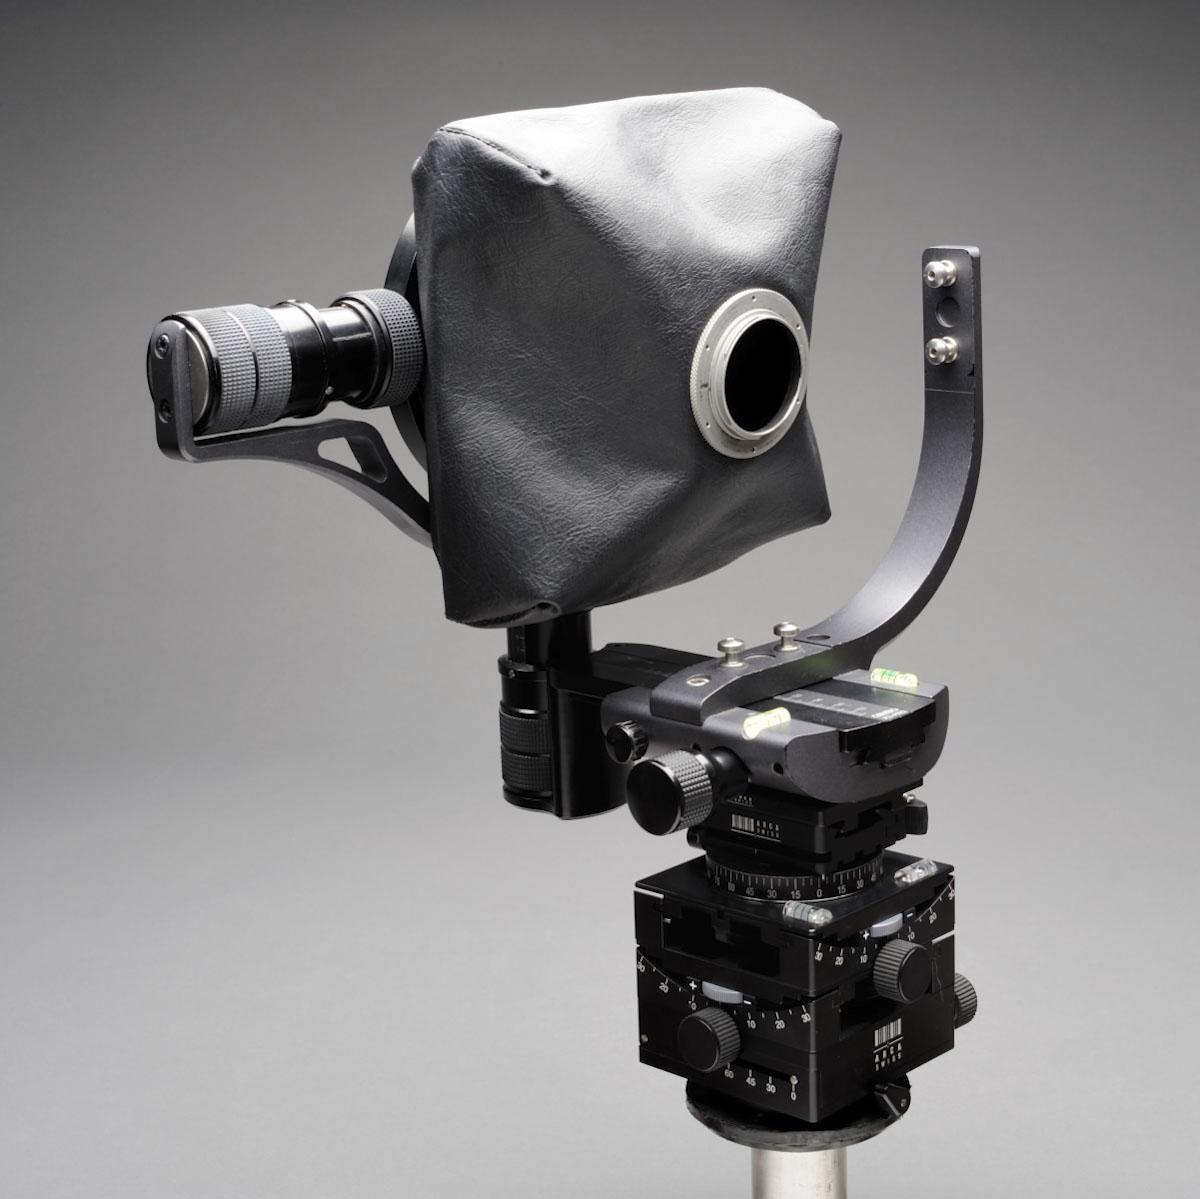 Nikon-D800-Cambo-X2-Pro-Schneider-Kreuznach-APO-90mm-f4.55